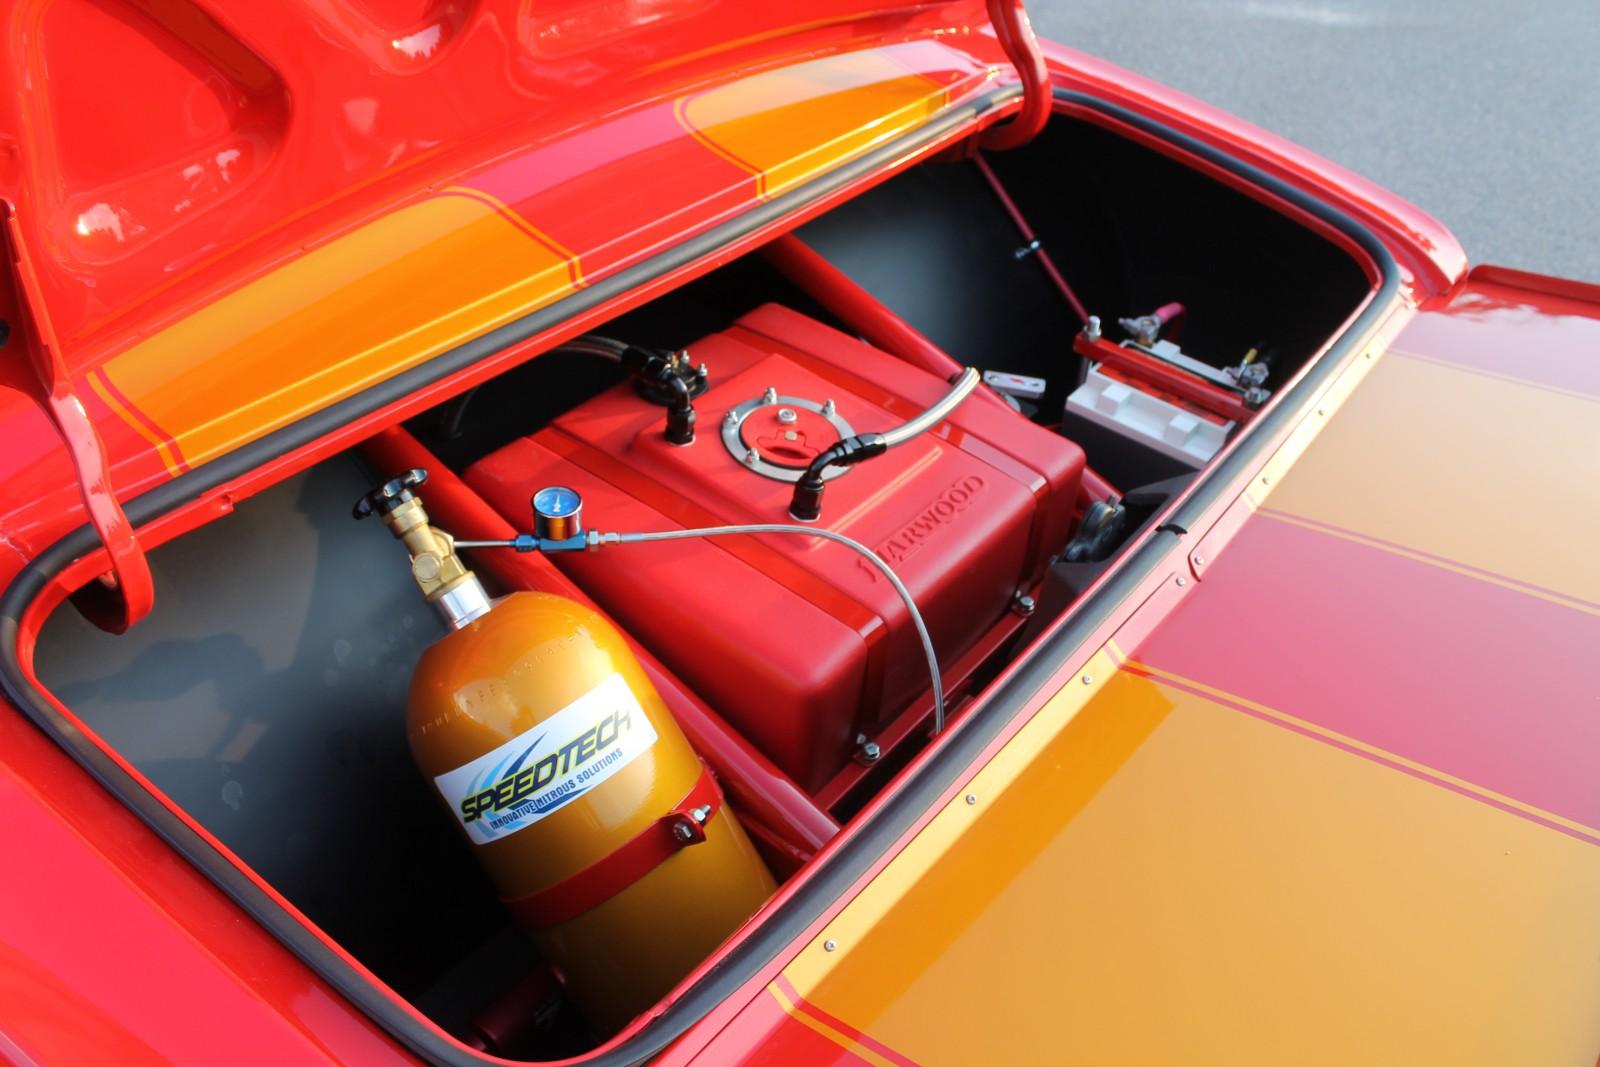 The 17-Year Camaro: Mike Norcia's '67 Chevy Camaro RS - OnAllCylinders